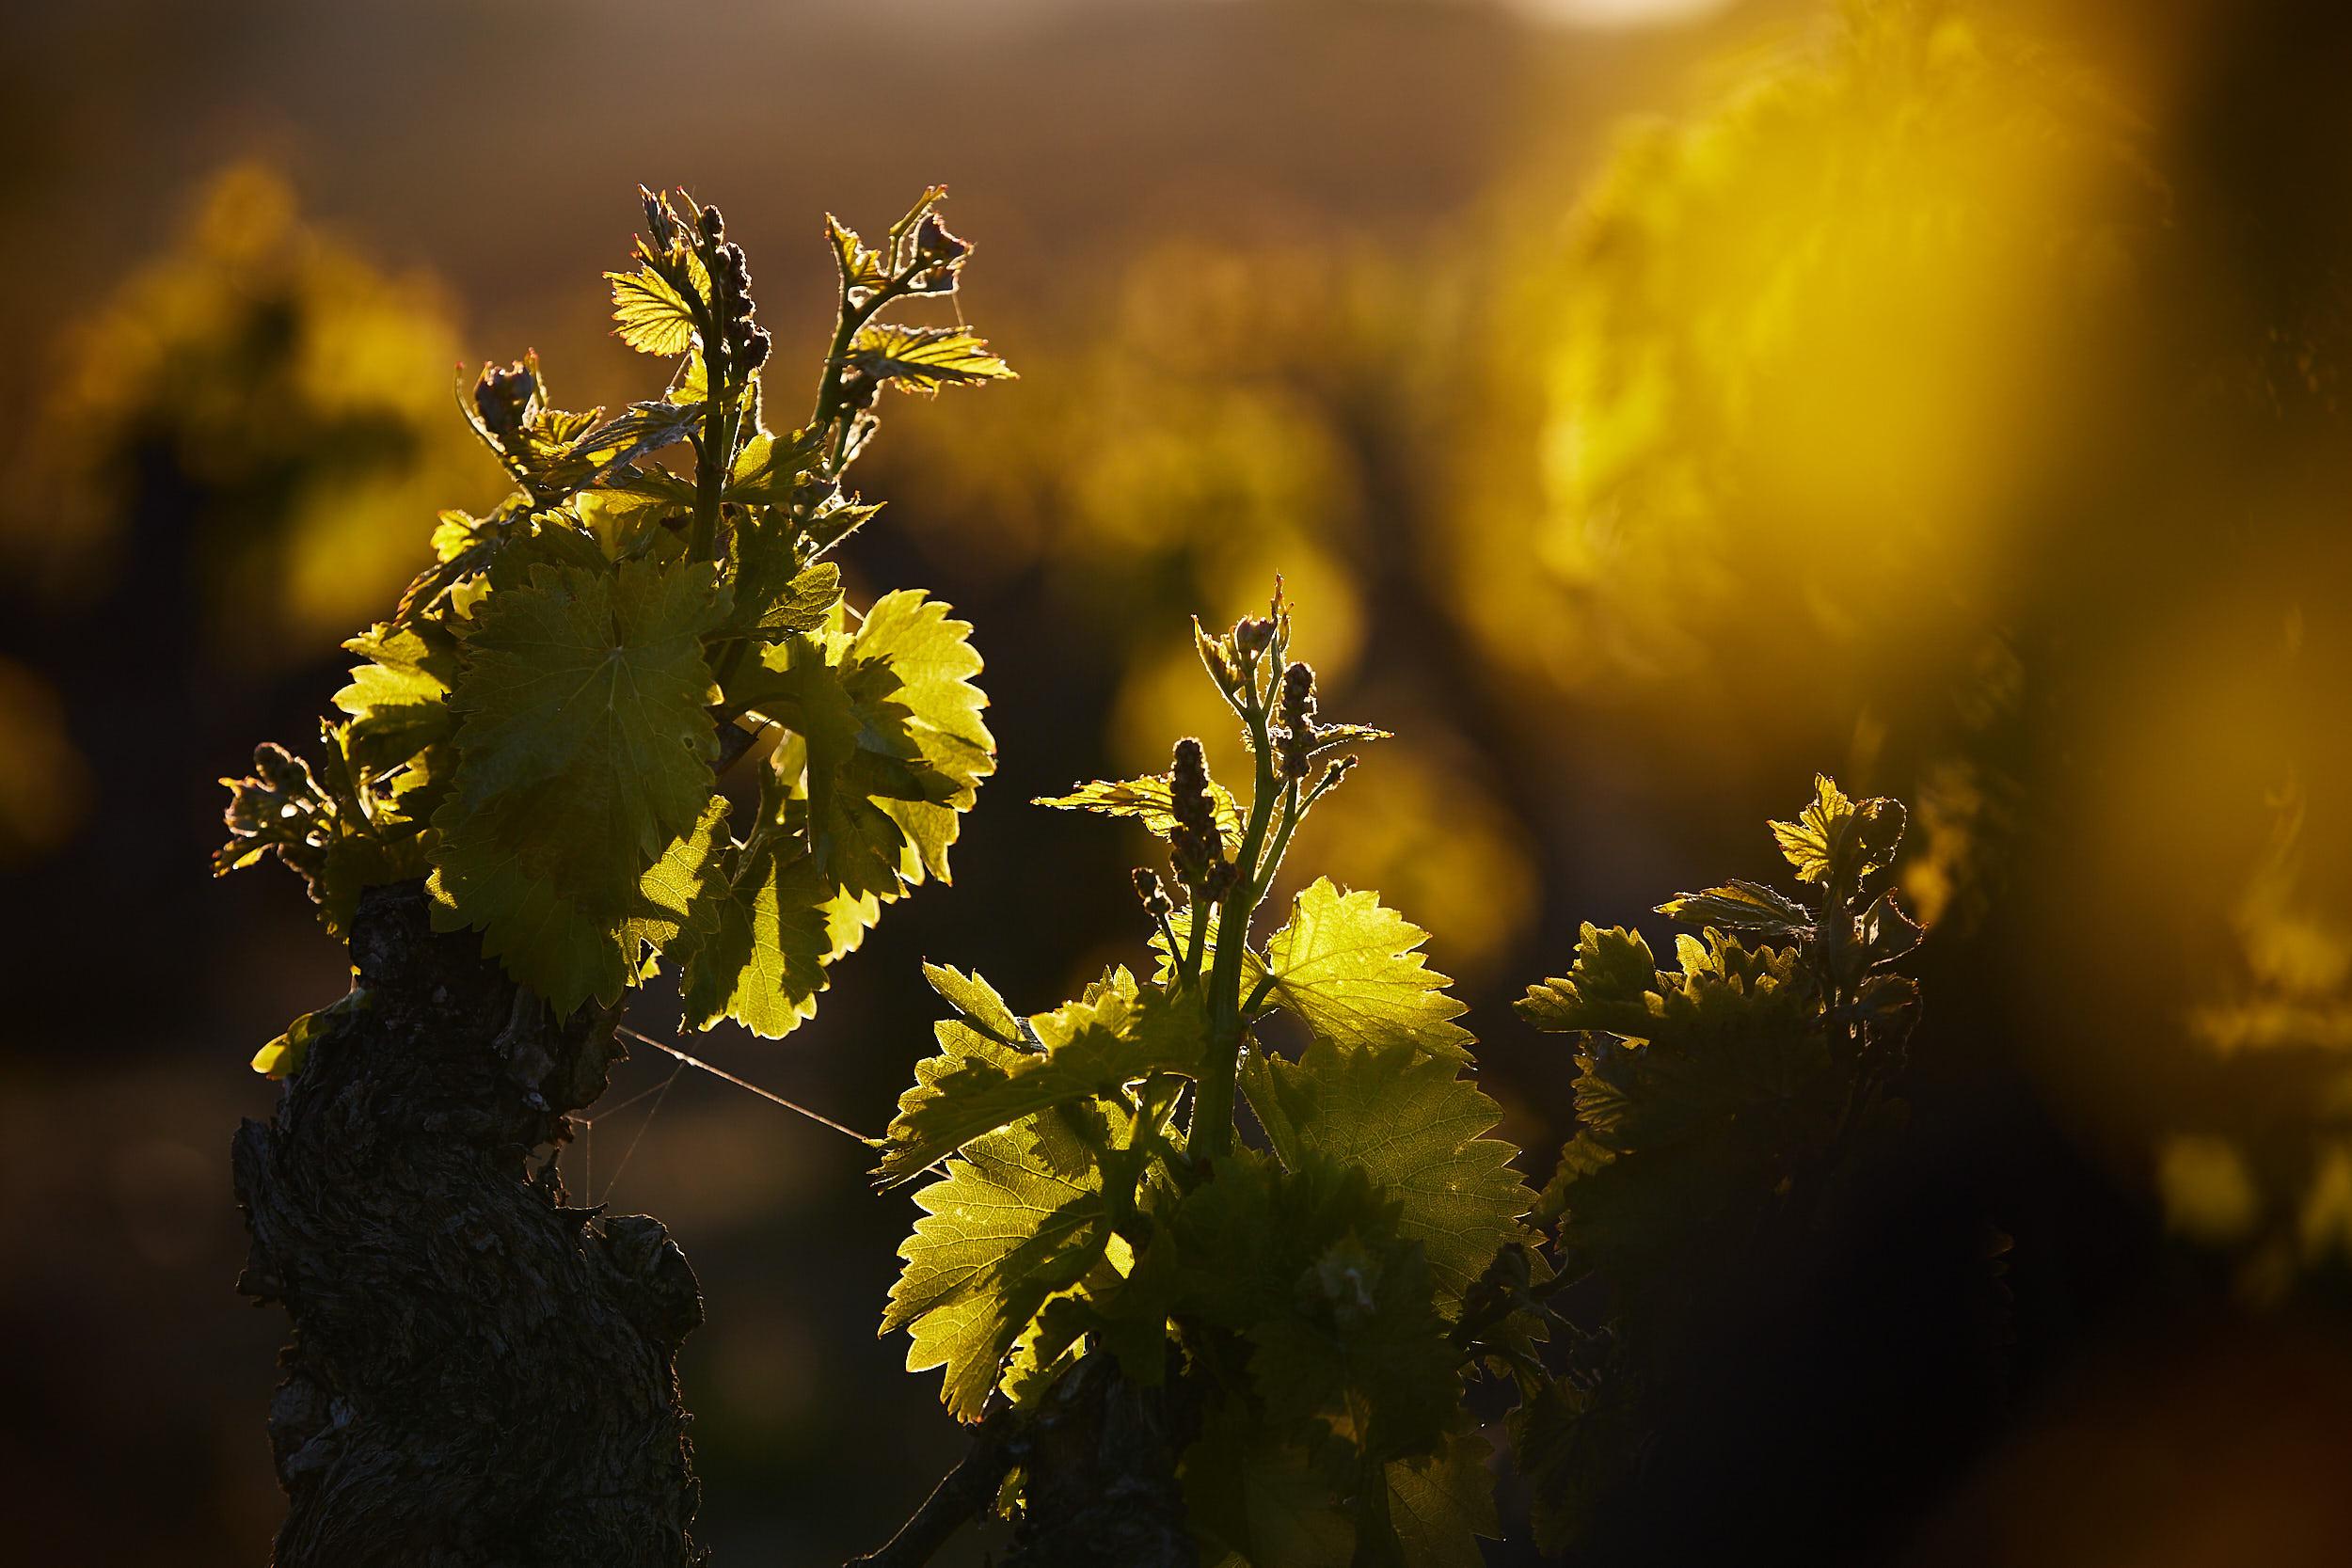 1805fotografia-profesional-corporativa-vino-rioja-espana-James-Sturcke_0013.jpg